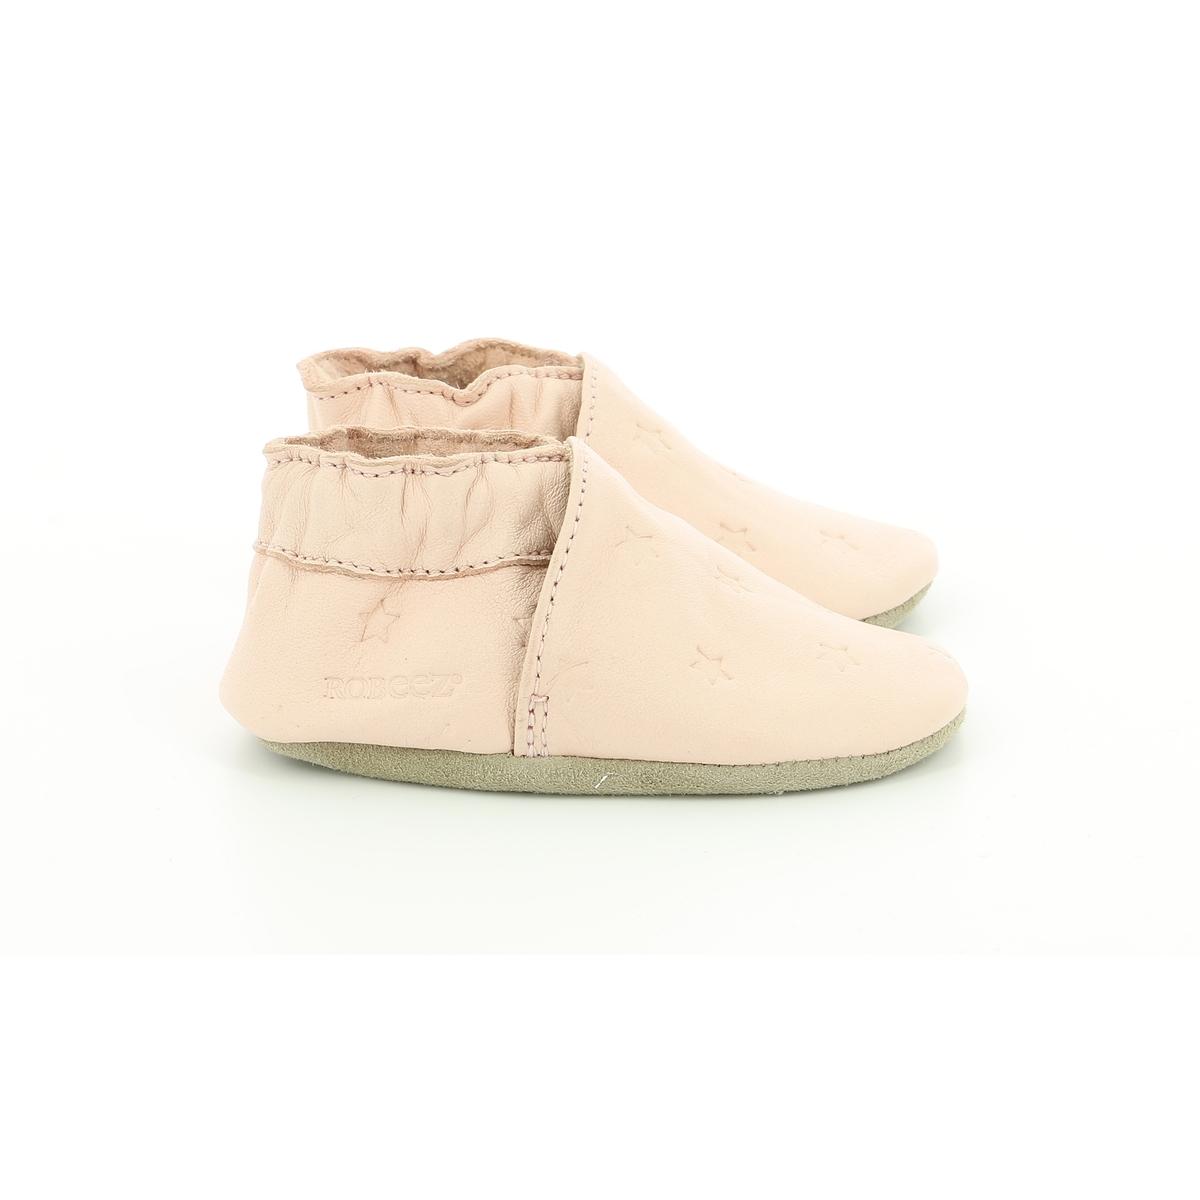 Туфли мягкие Dressy от ROBEEZ